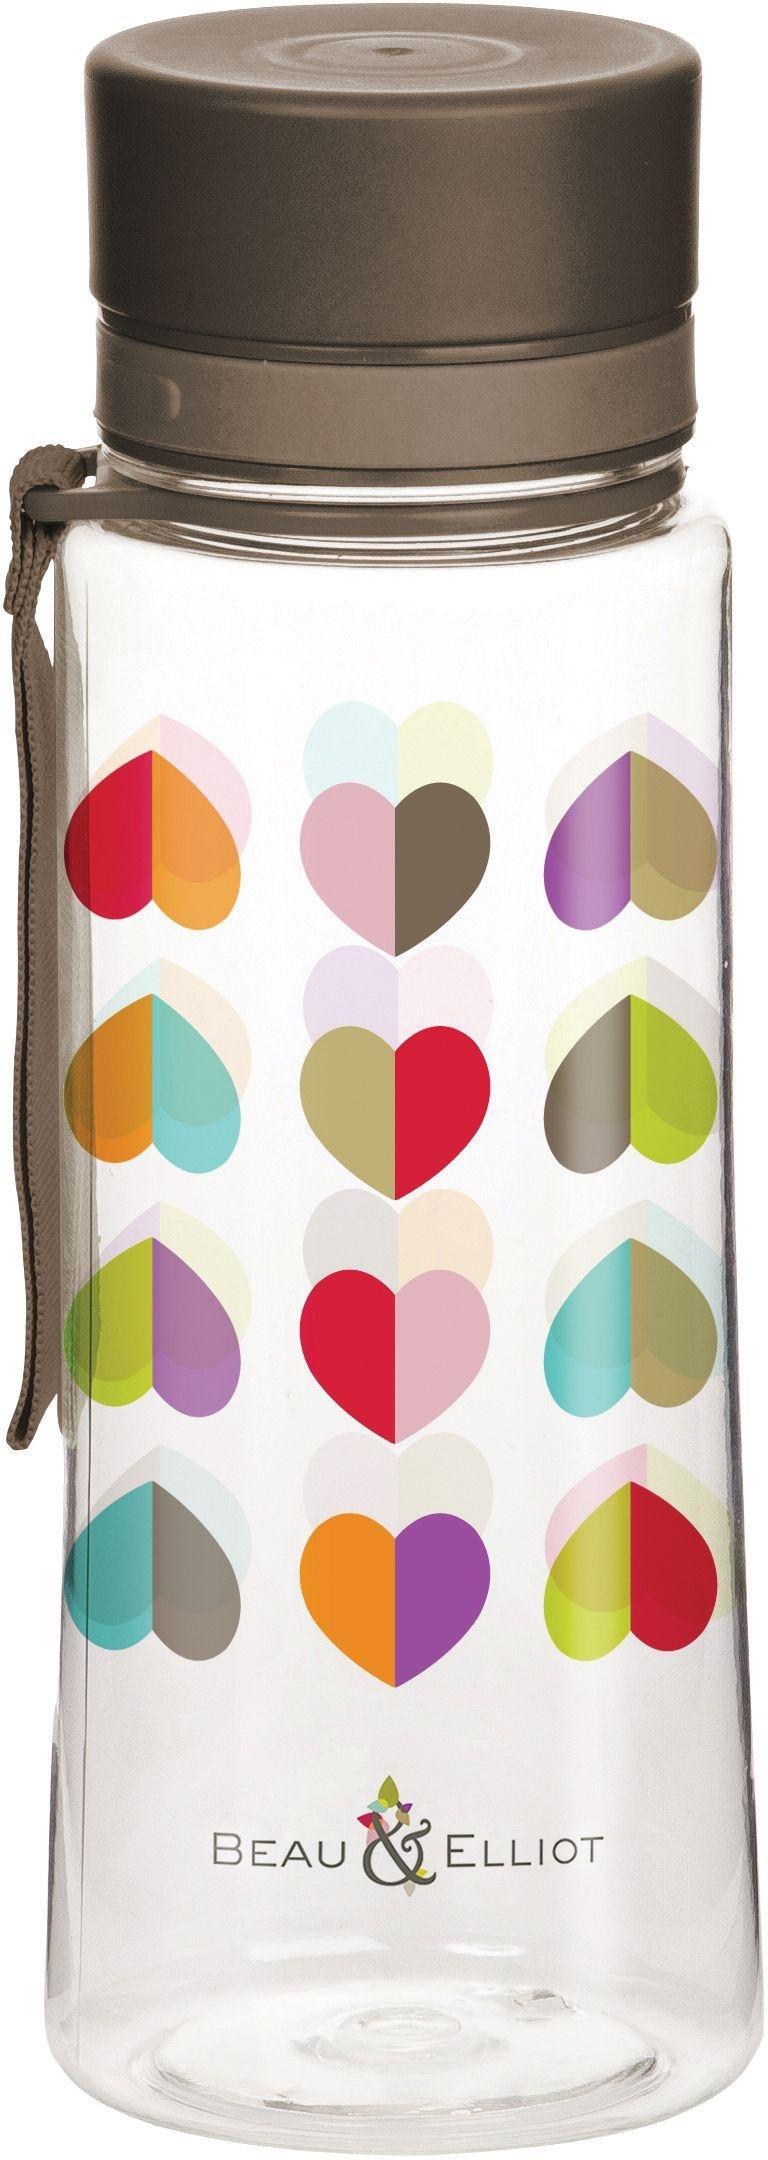 Image of Beau and Elliot - Confetti Hydration Bottle - Multicoloured